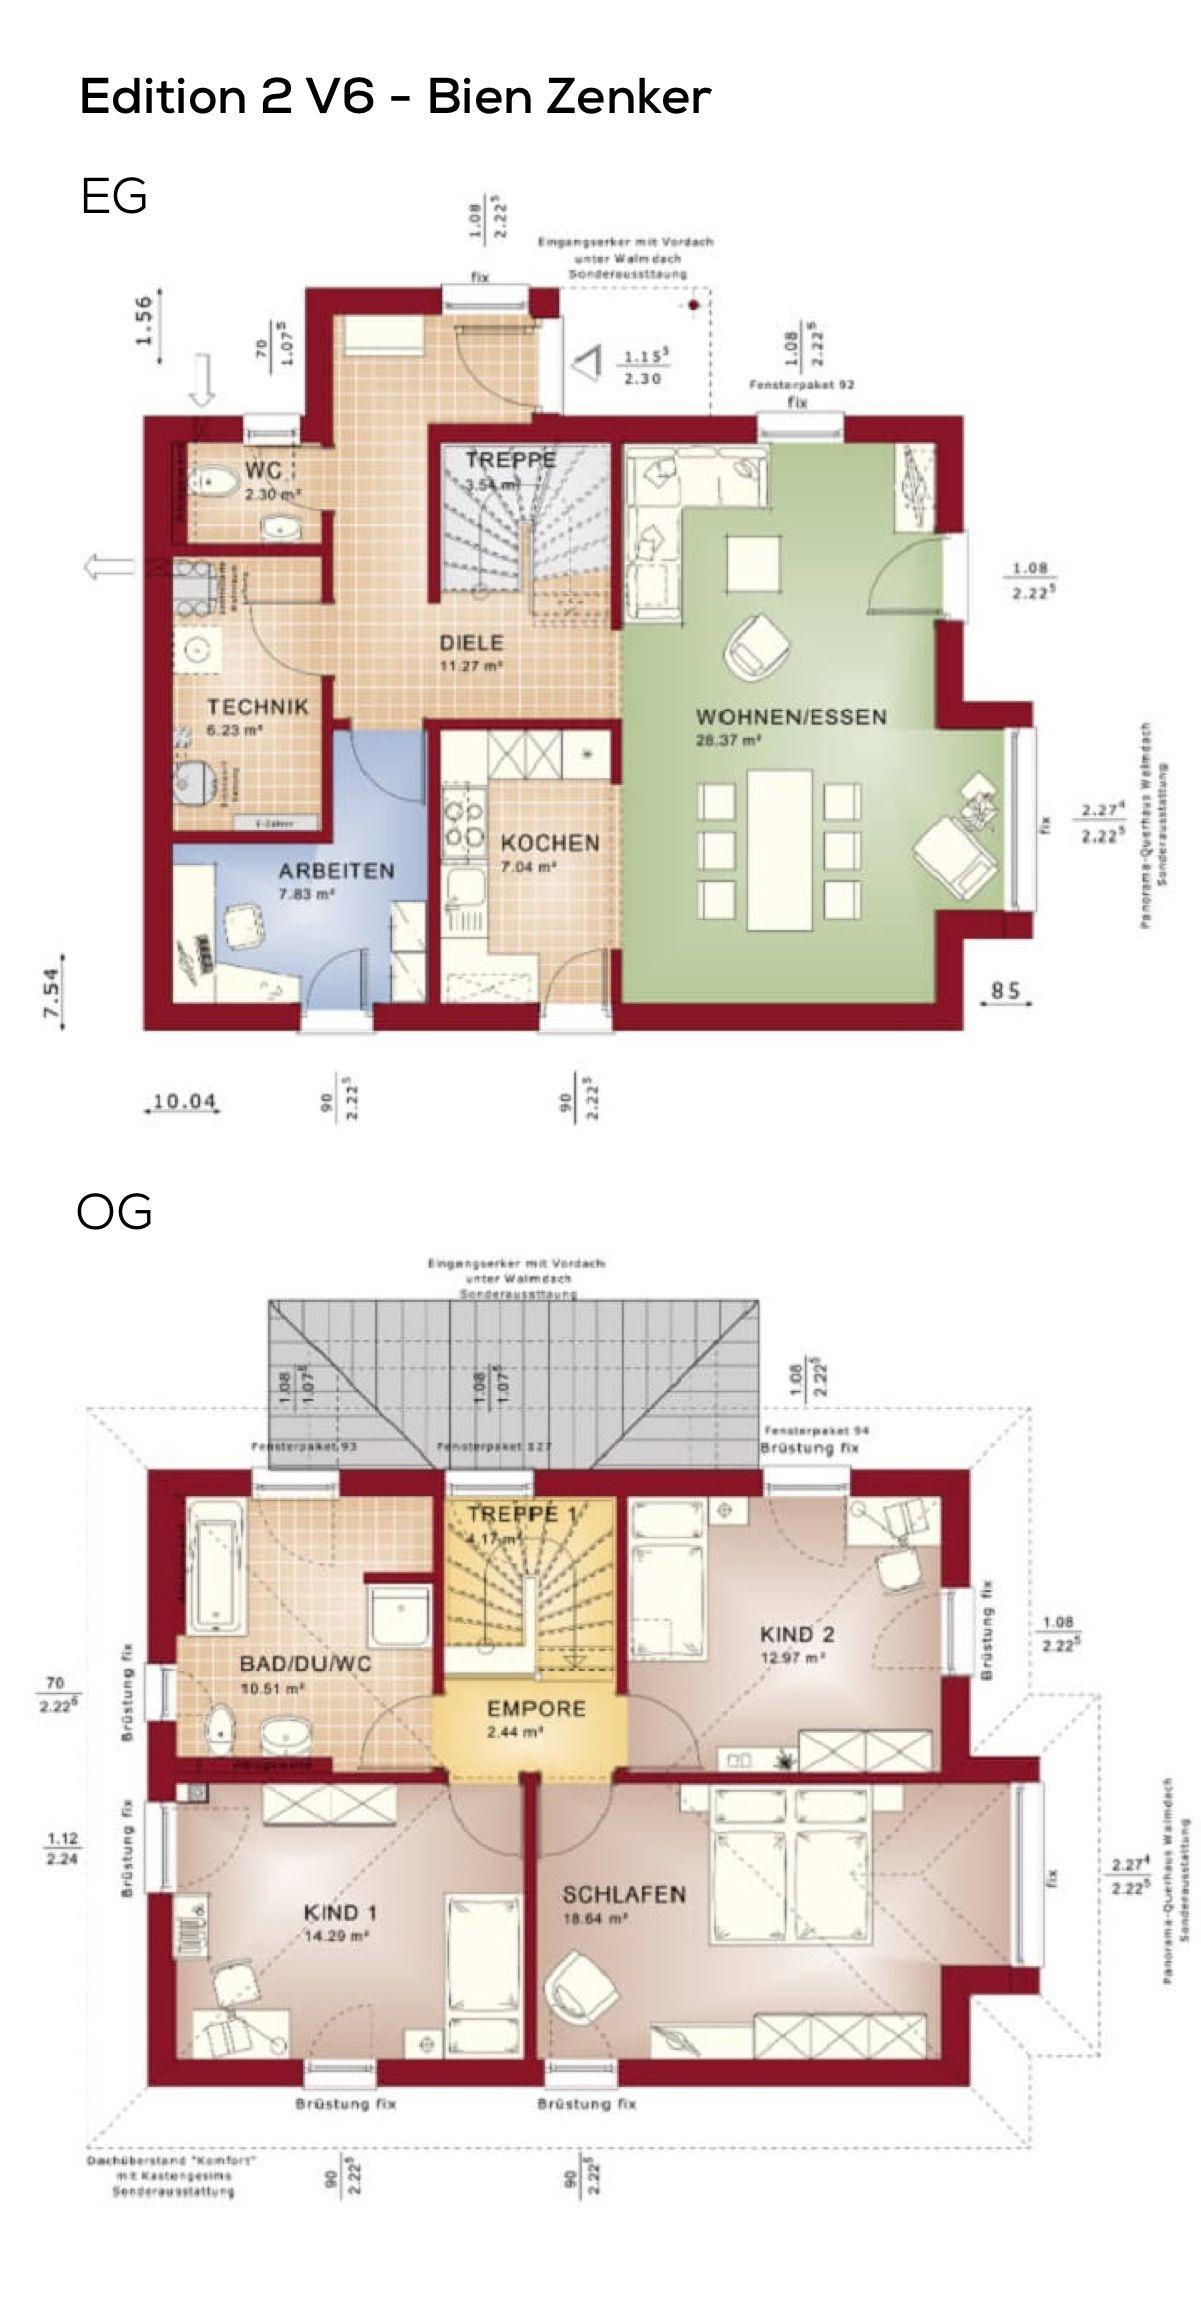 Grundriss einfamilienhaus stadtvilla modern mit klinker for Grundriss einfamilienhaus 2 vollgeschosse